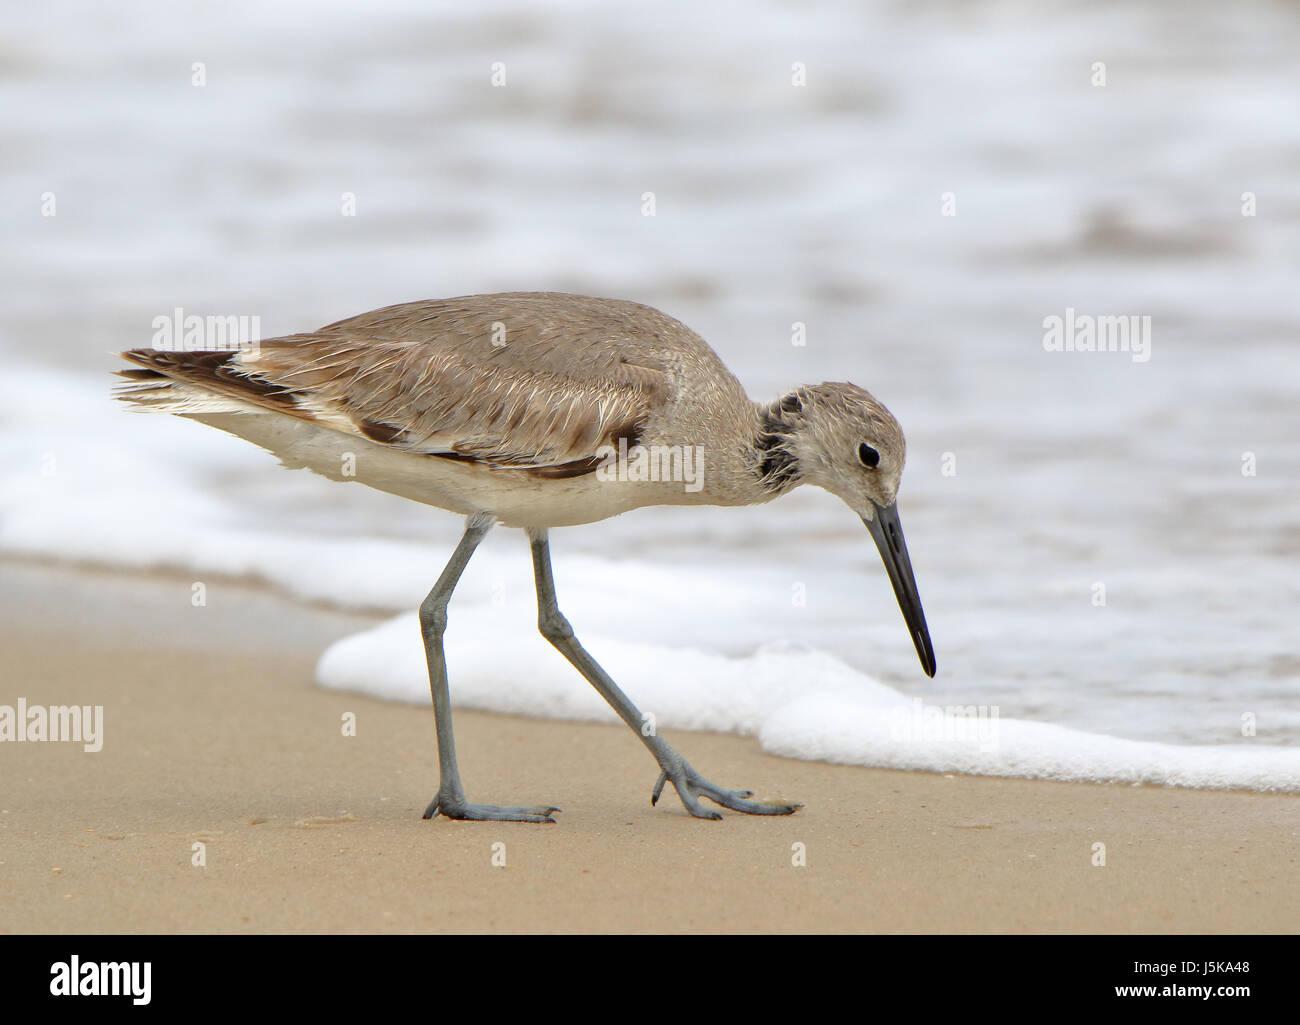 Shorebird (willet) walking in the surf in Florida Stock Photo